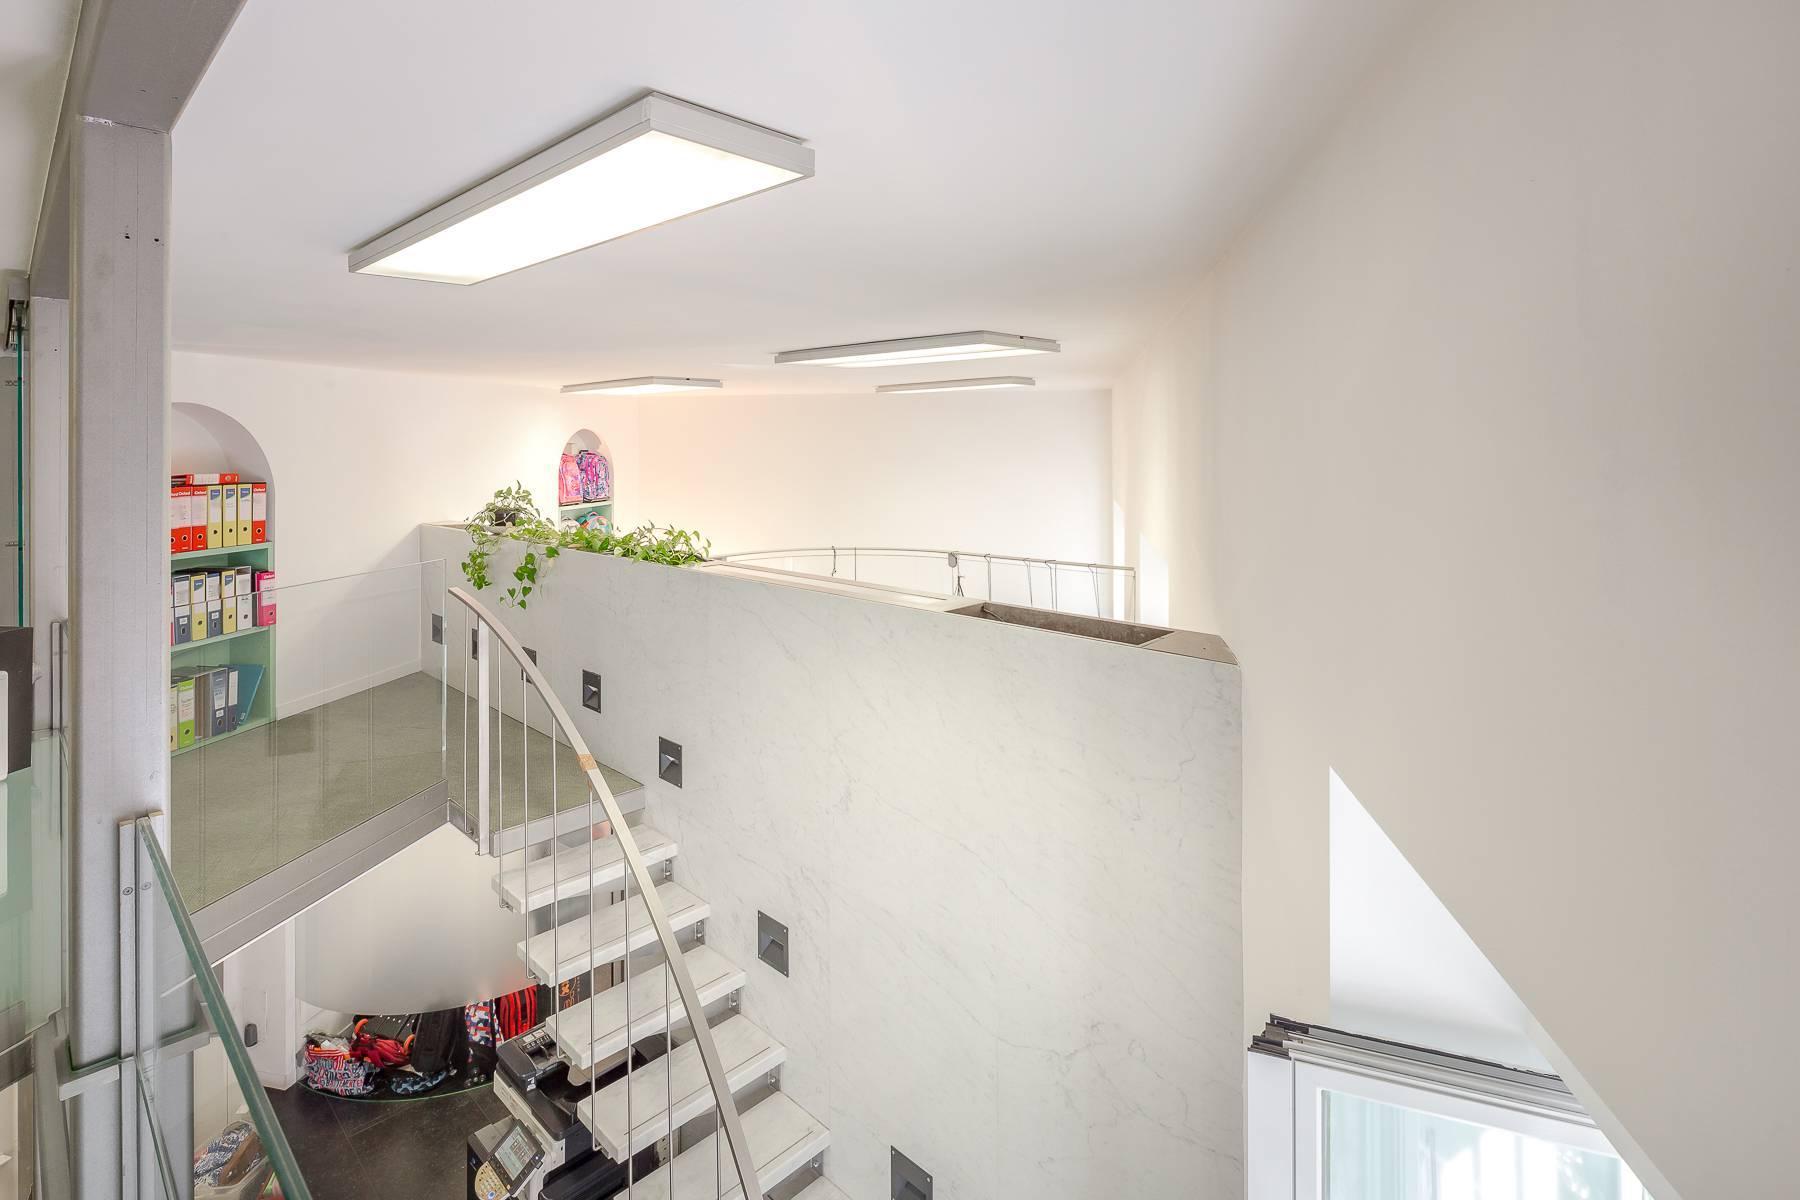 Open space office/residential property in Piazza Giovine Italia/Via Aurelio Saffi - 15